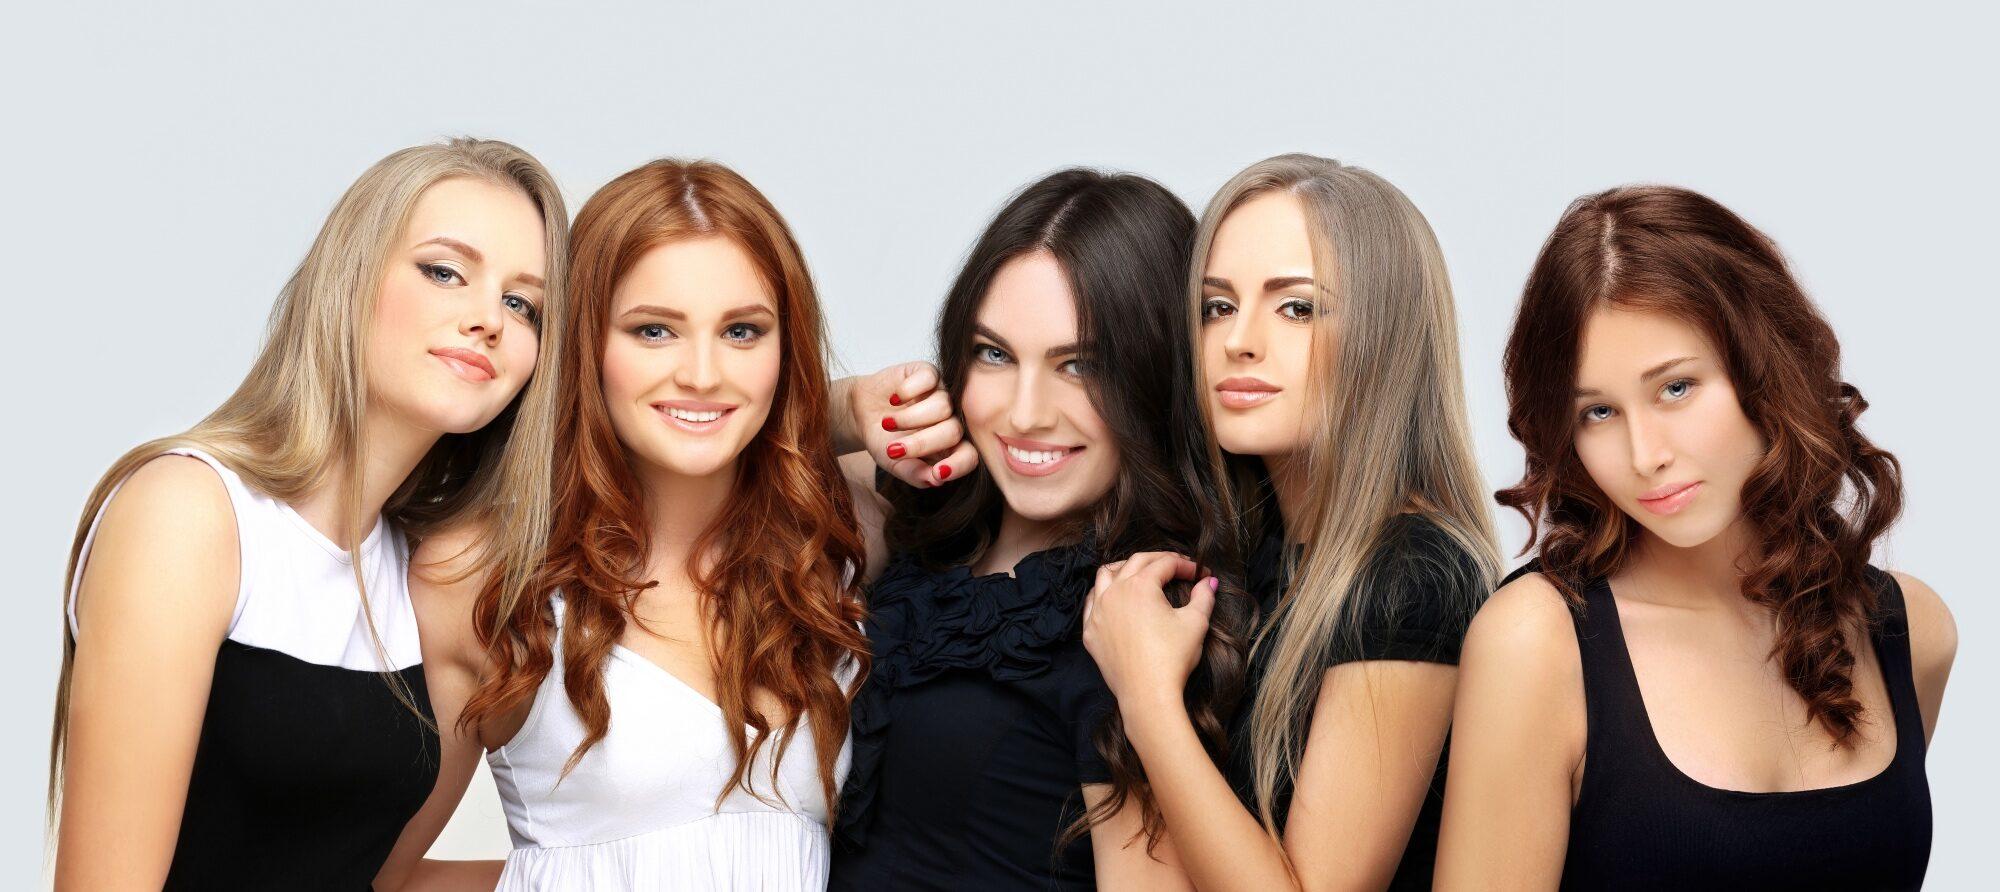 LOVEHAIR|女性のための市販シャンプー解析&ランキングならラブヘア -powered by トレ速-